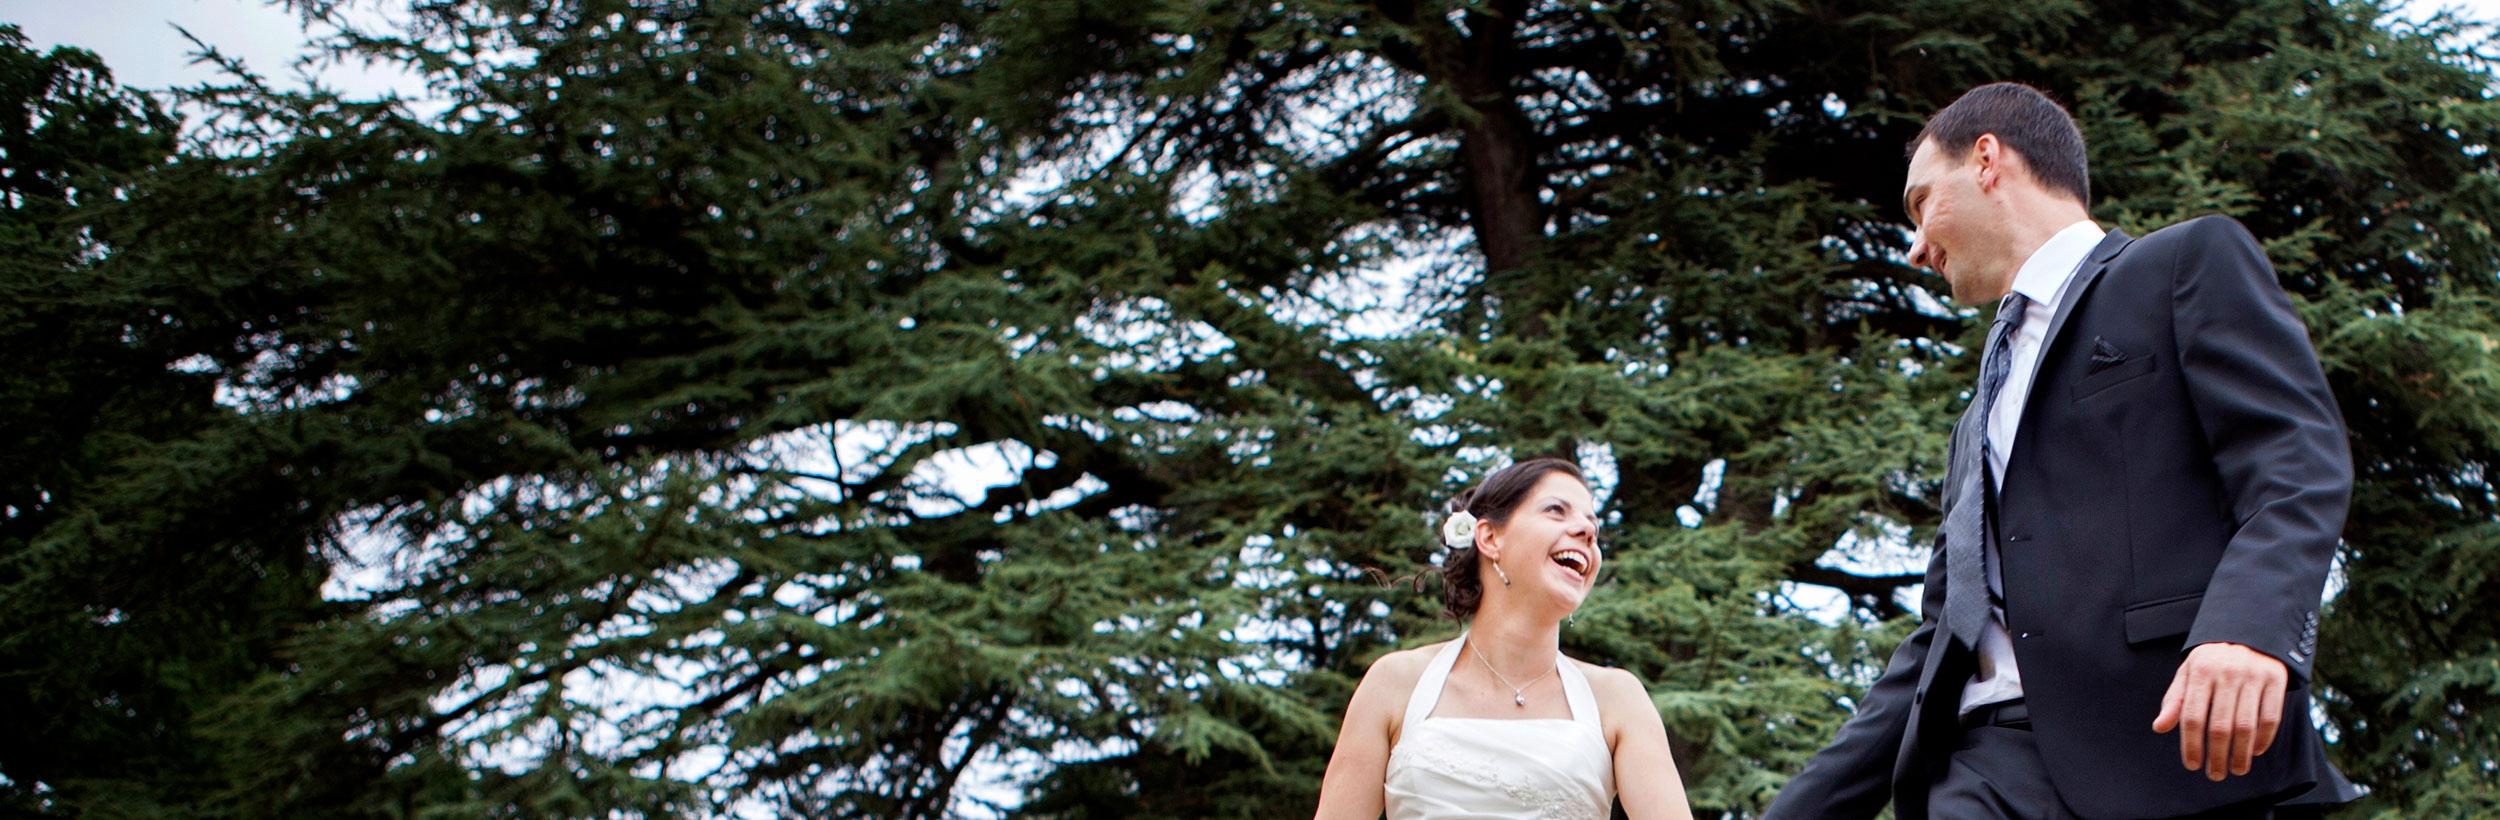 mariage-audrey-matthieu-pagetop